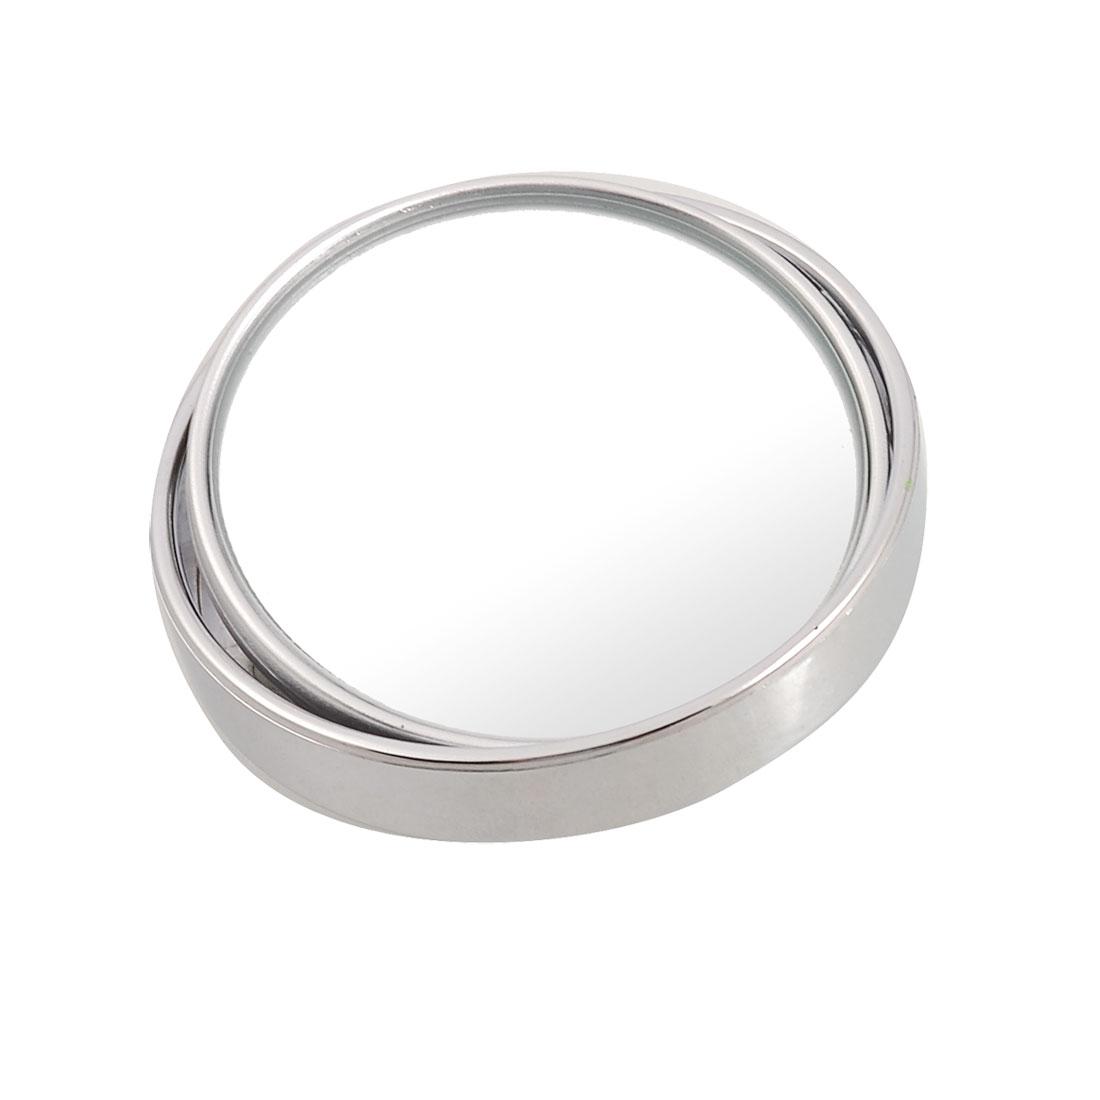 "Silver Tone 50mm 2"" Round Convex Blind Spot Mirror for Car Auto"